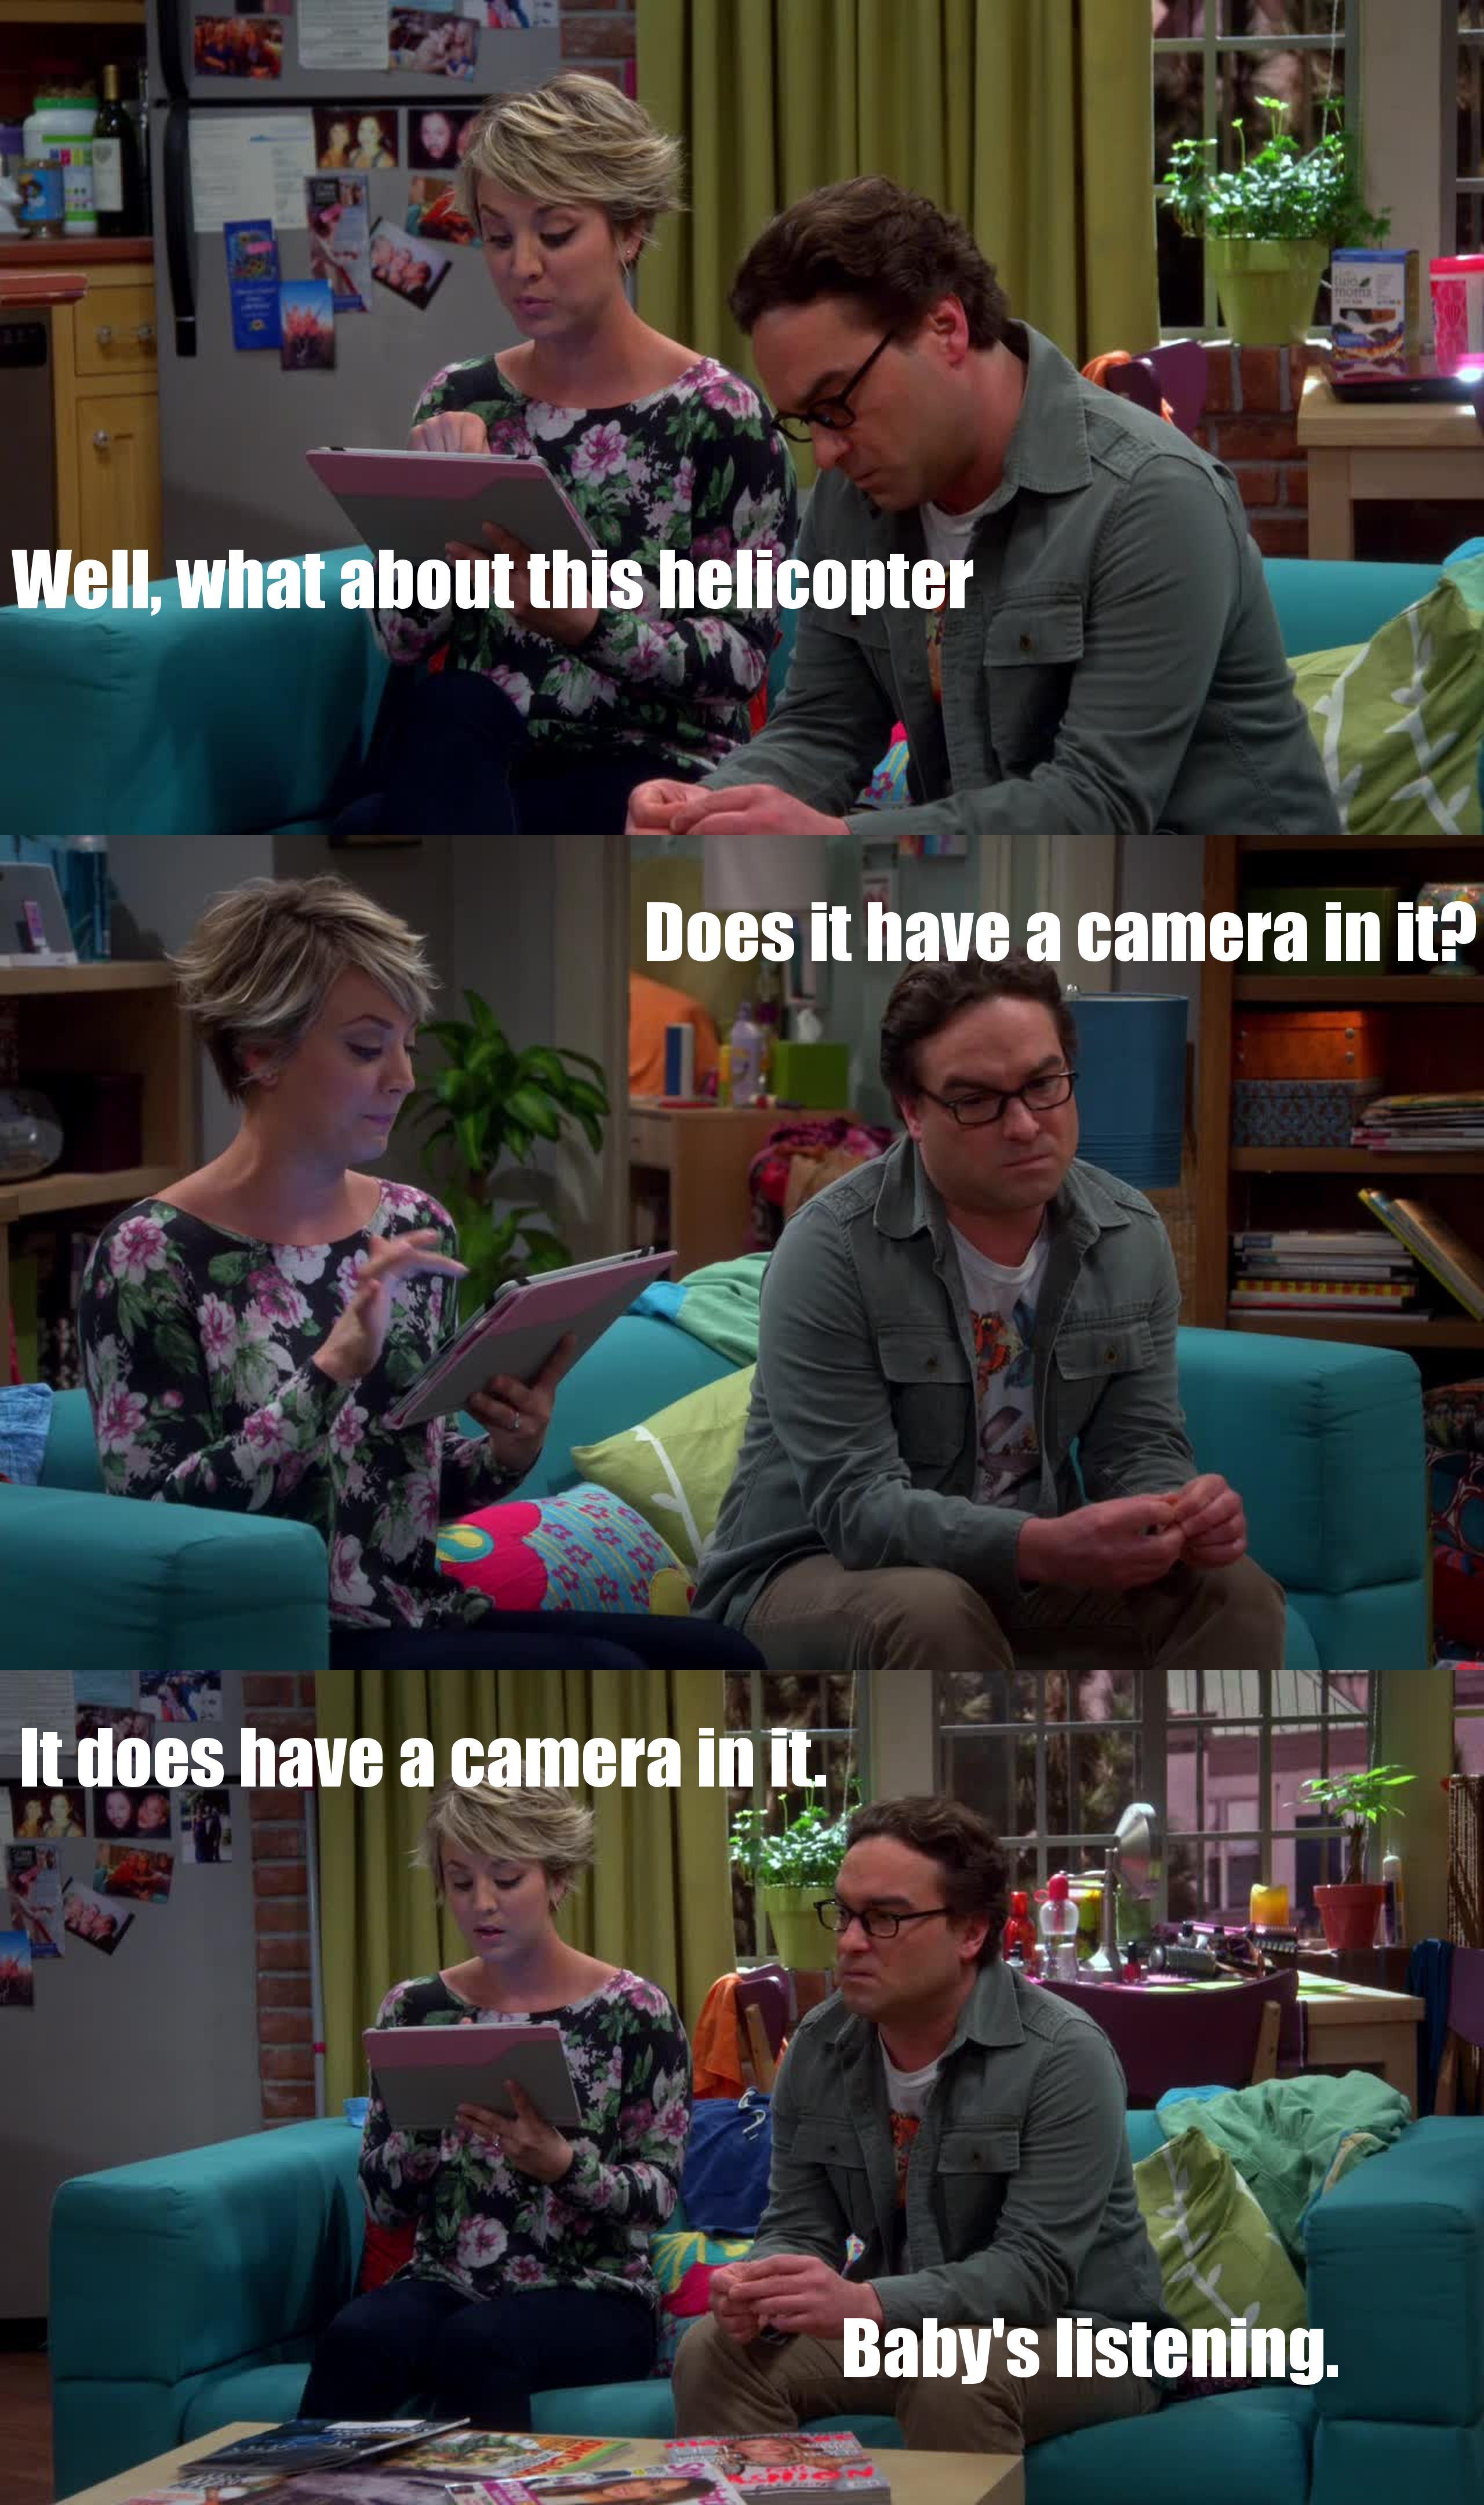 Hahahahaha epic :)